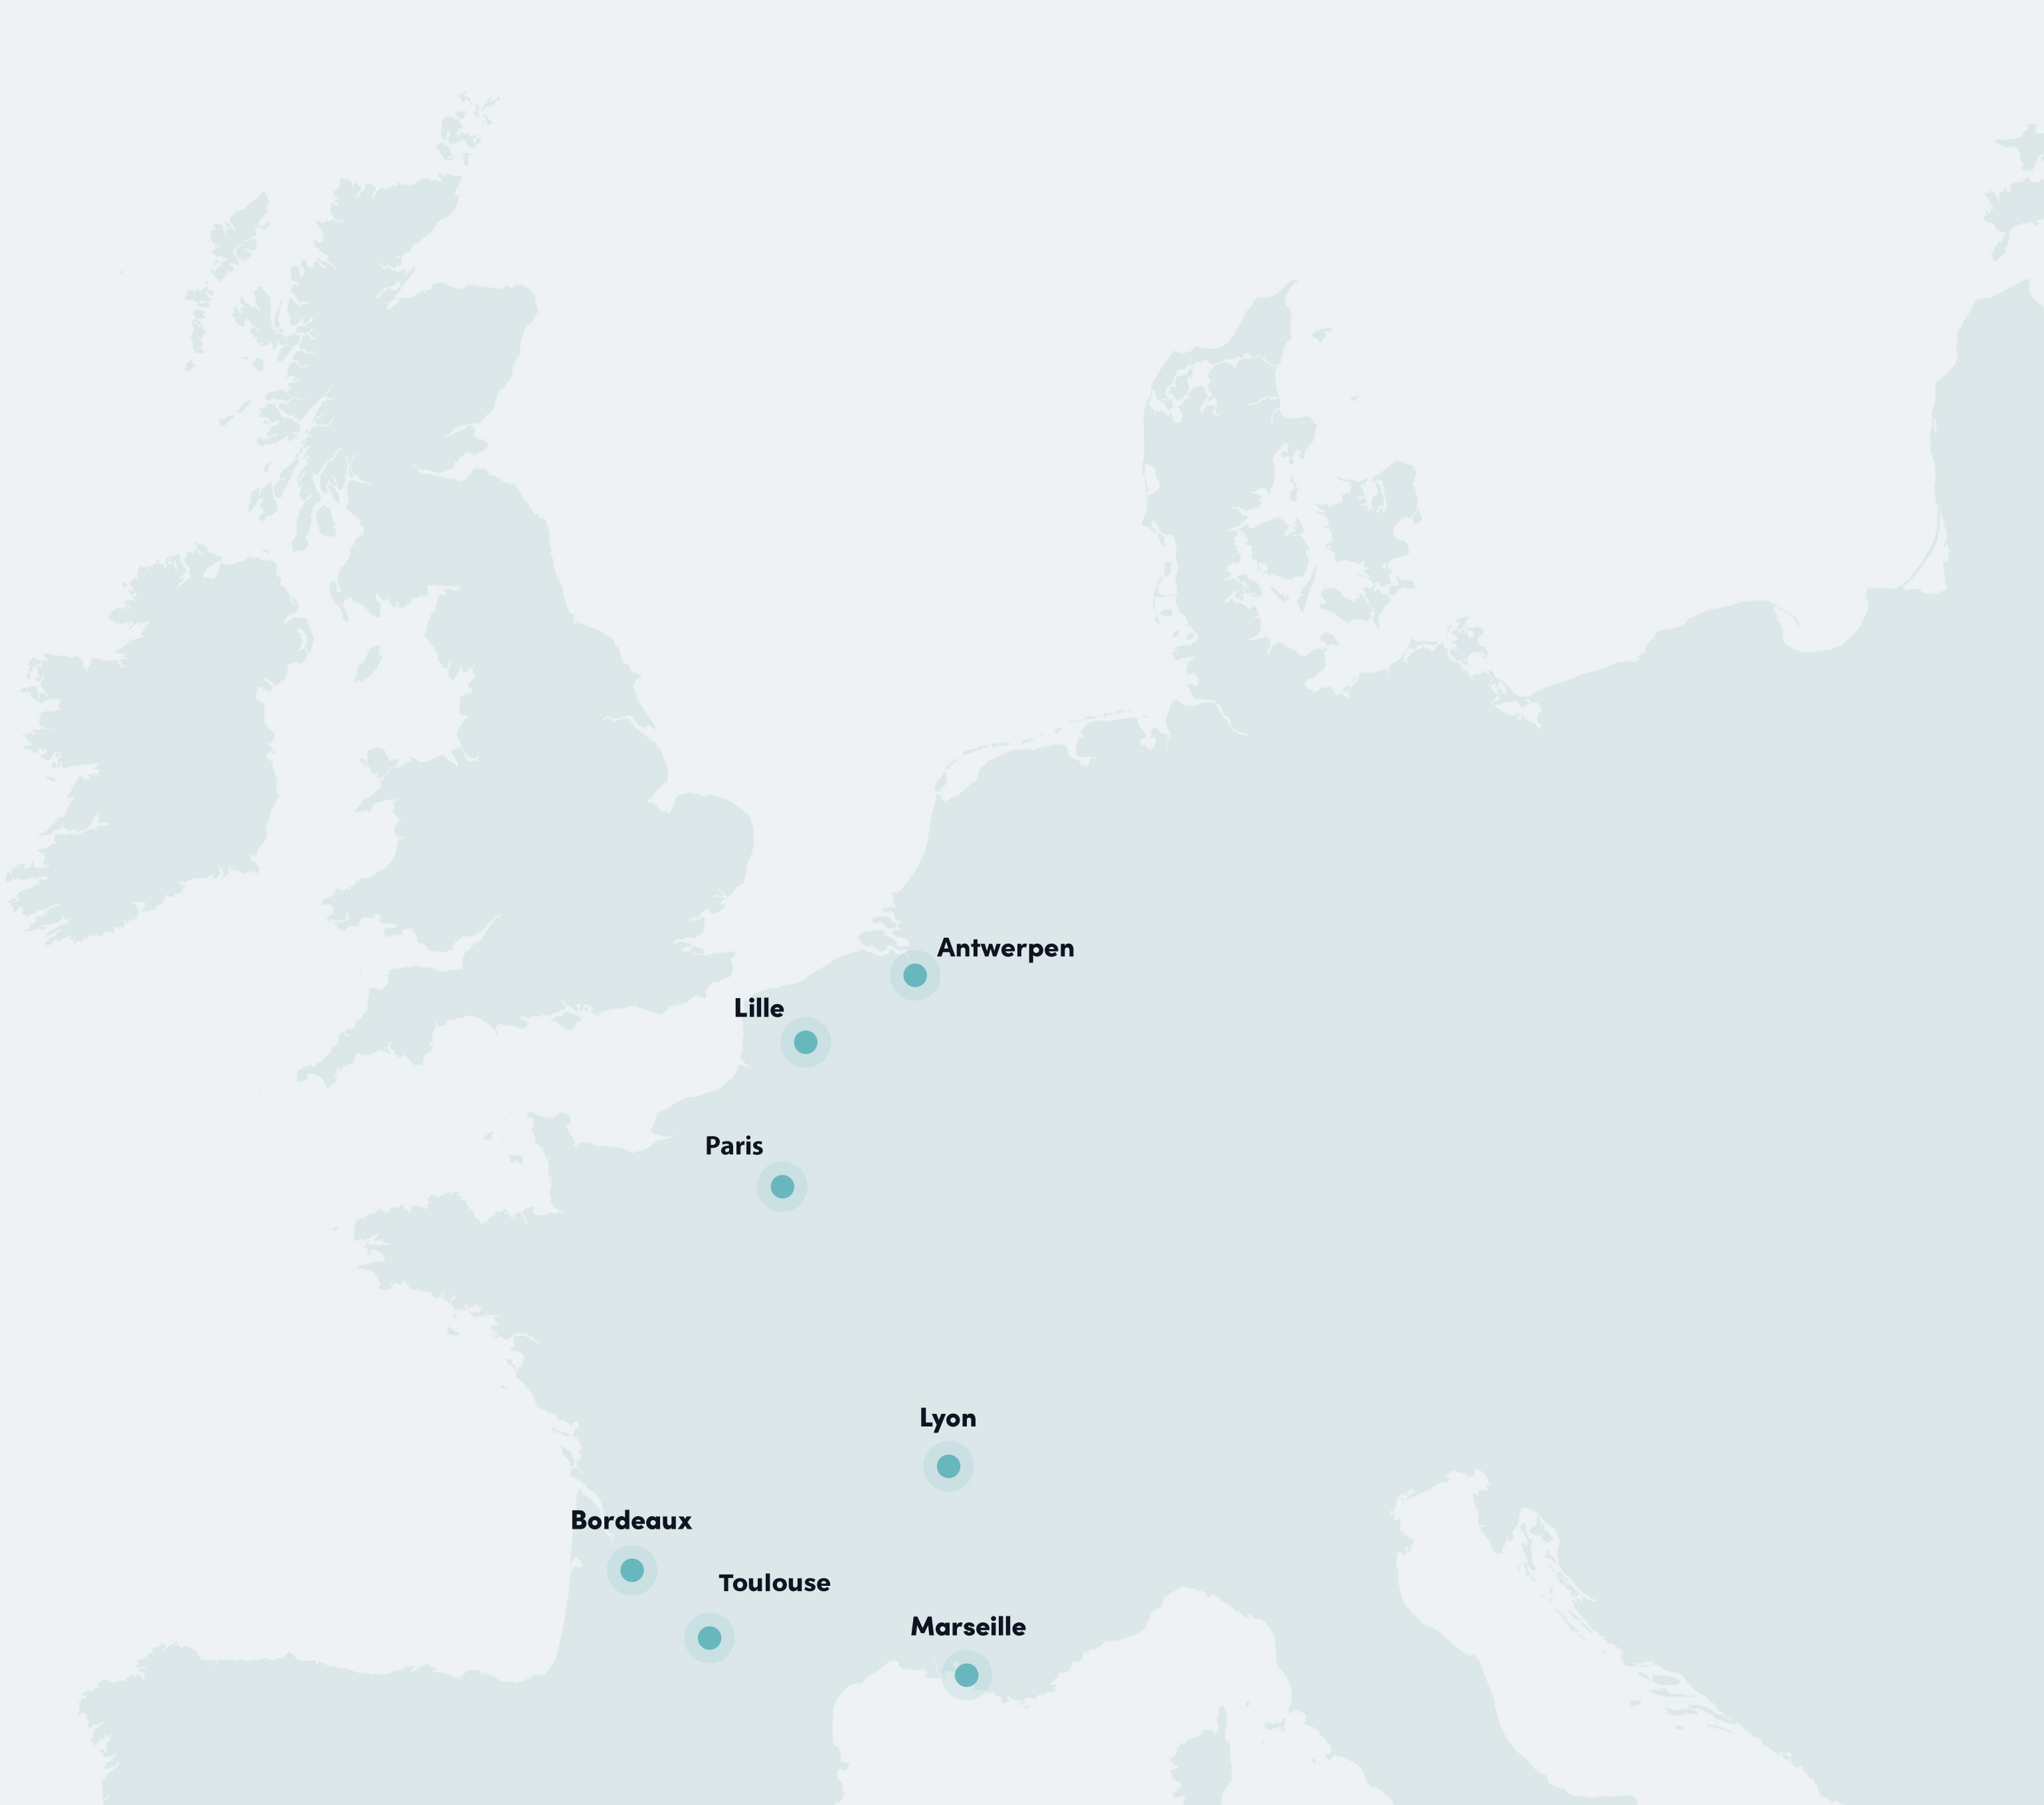 carte des coworking hubs Geninc